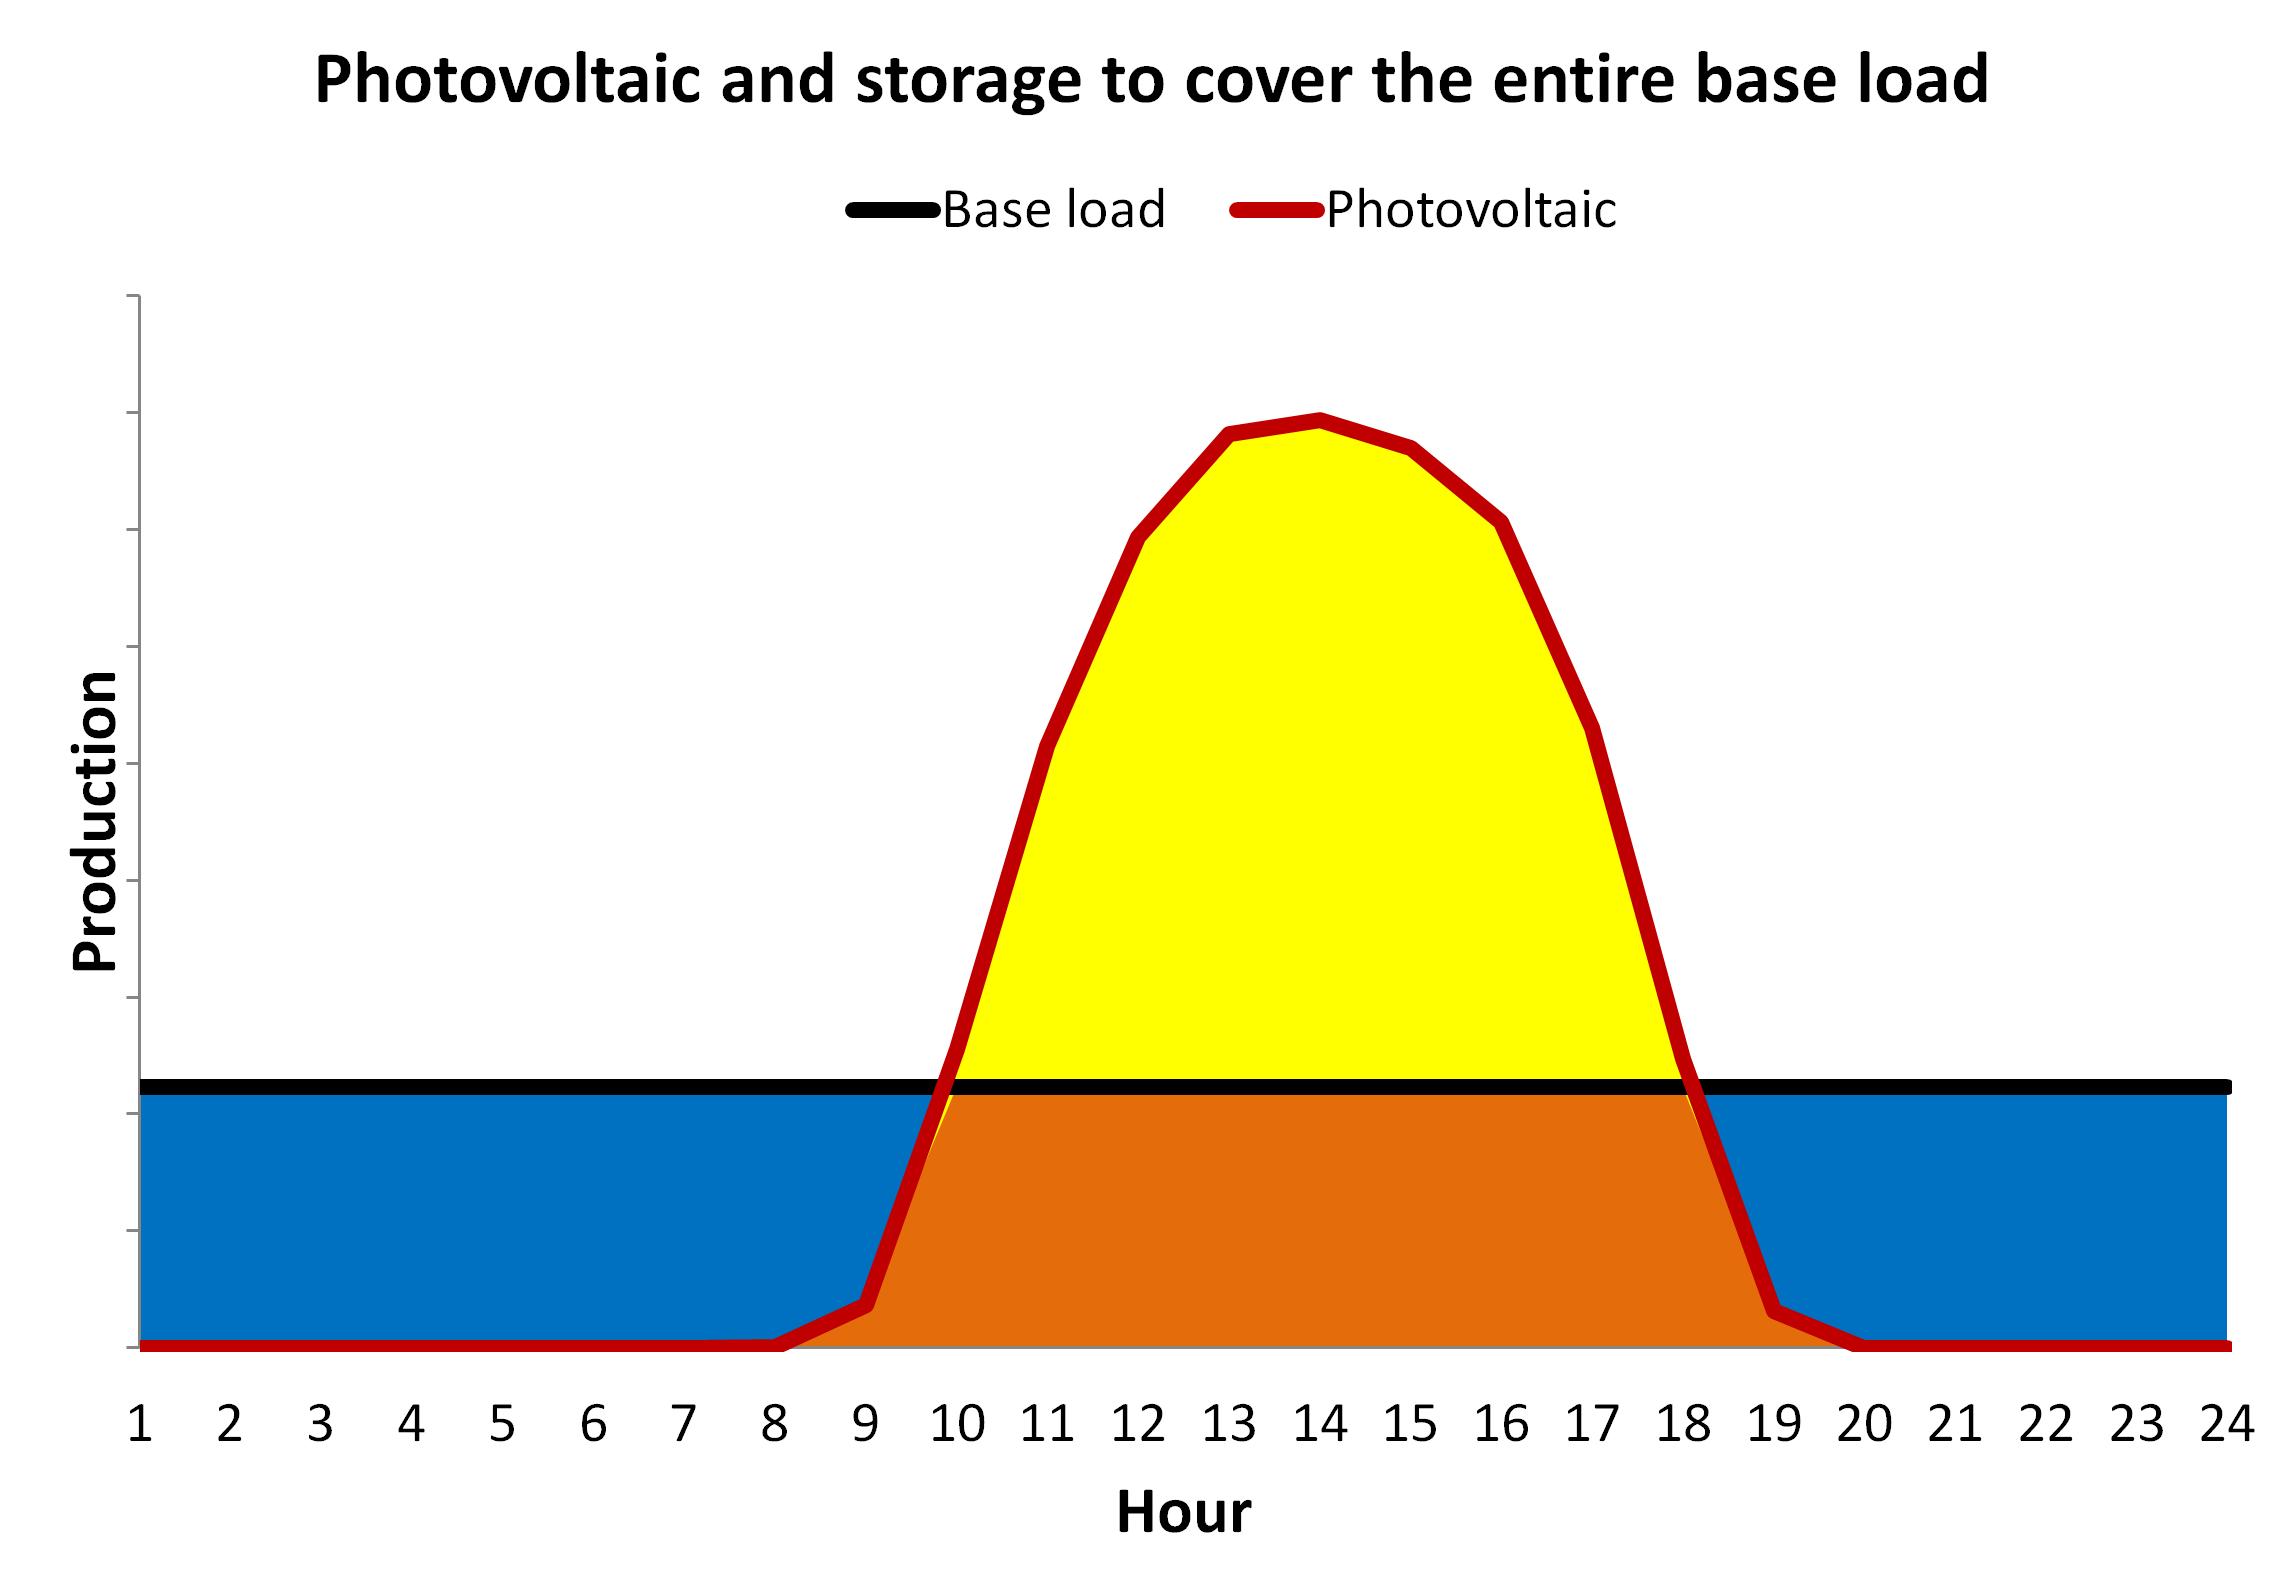 AleaSoft - Photovoltaic storage base load